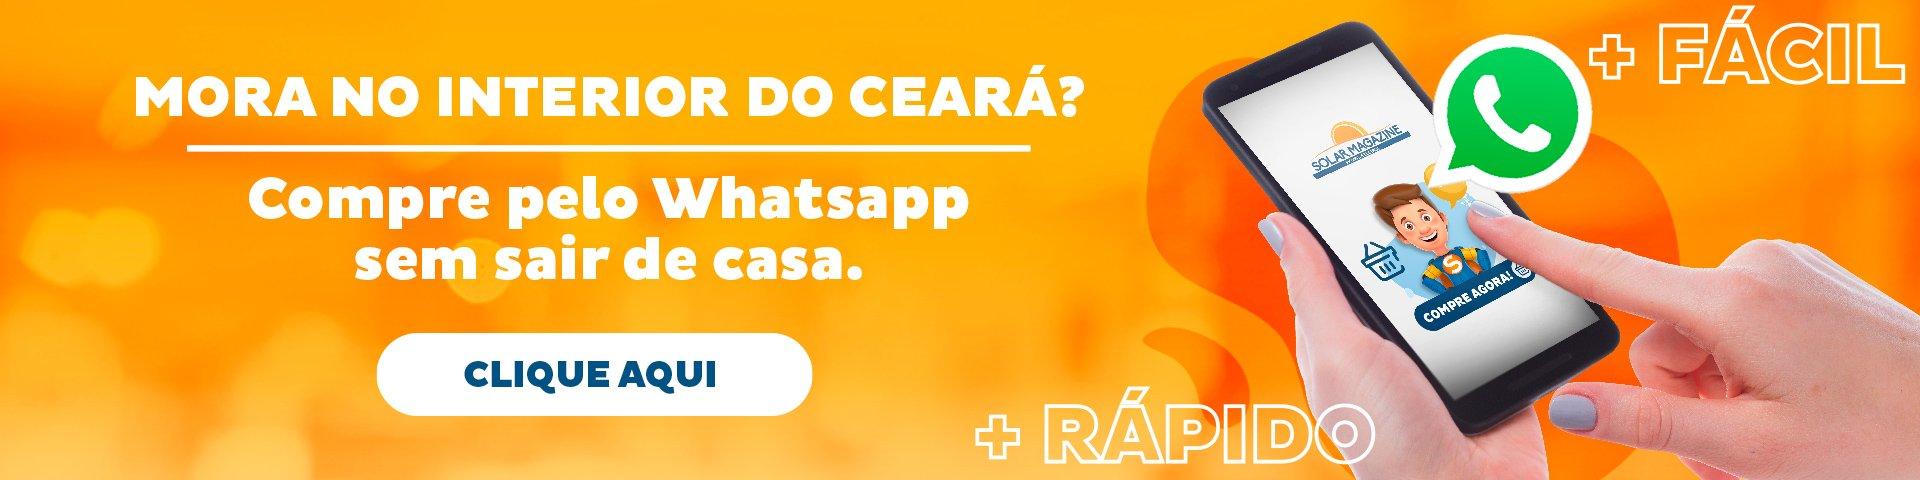 Banner Whatsapp